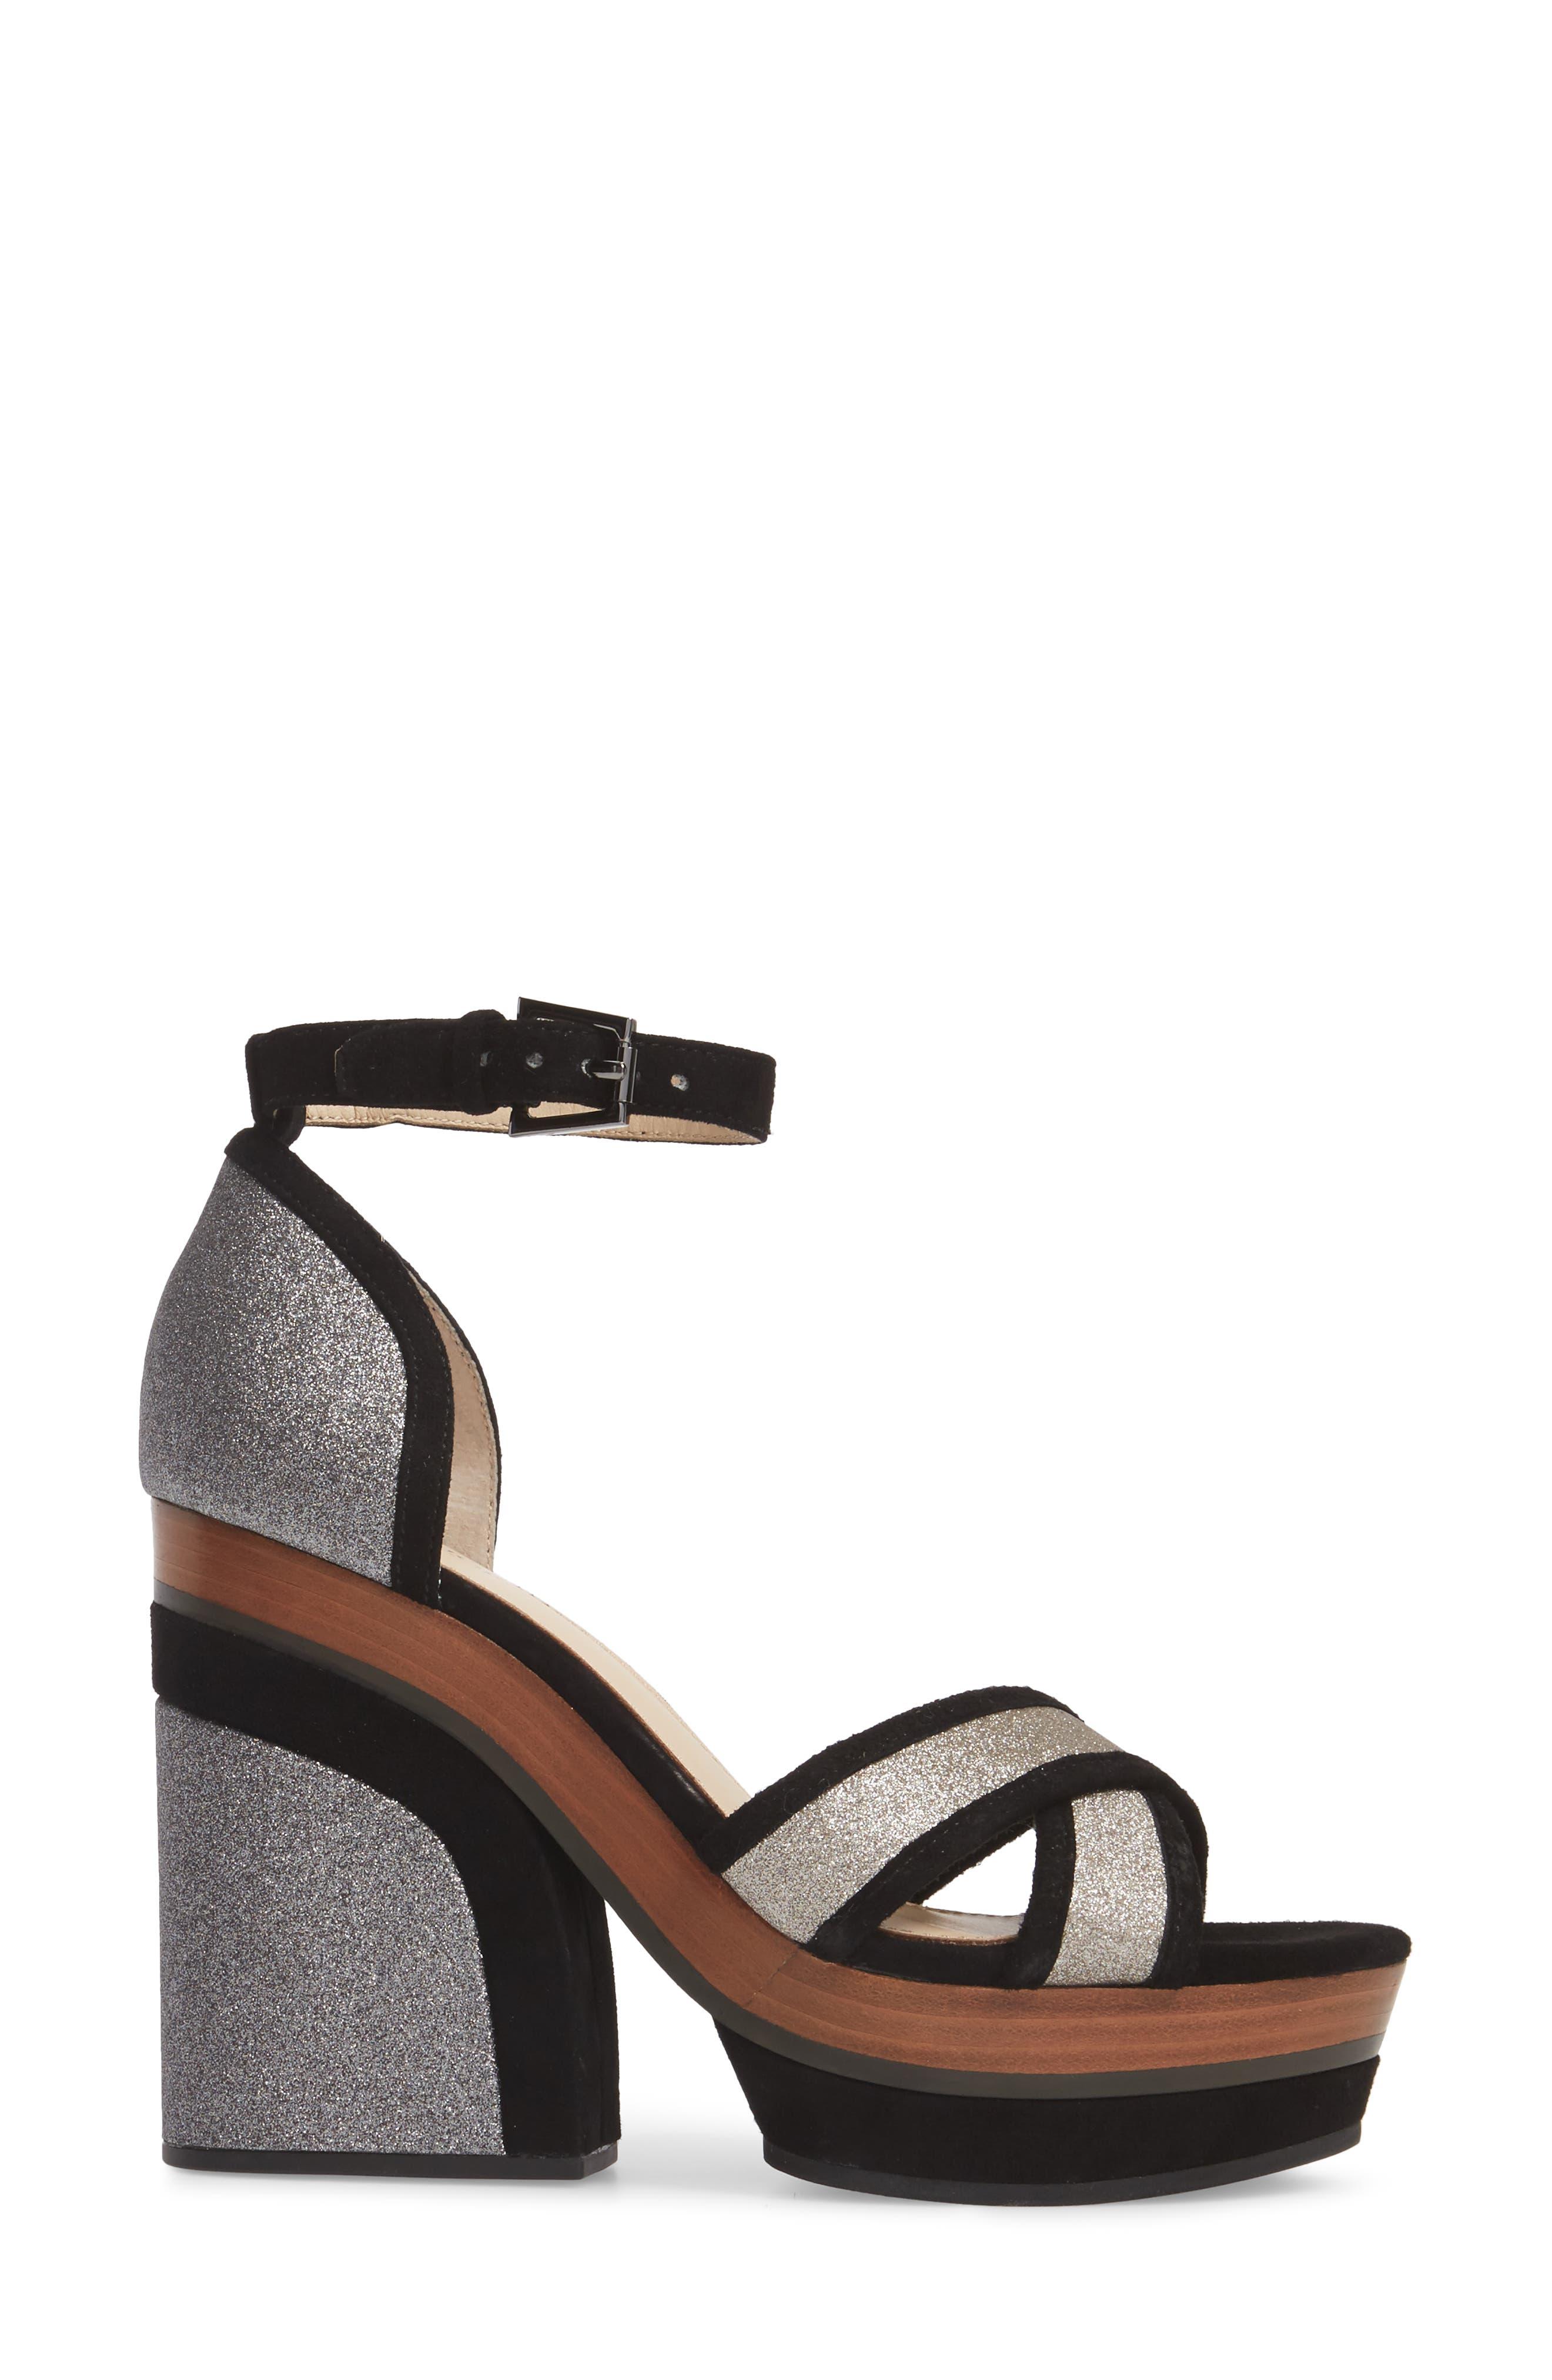 Paloma Ankle Strap Sandal,                             Alternate thumbnail 3, color,                             GUNMETAL GLITTER